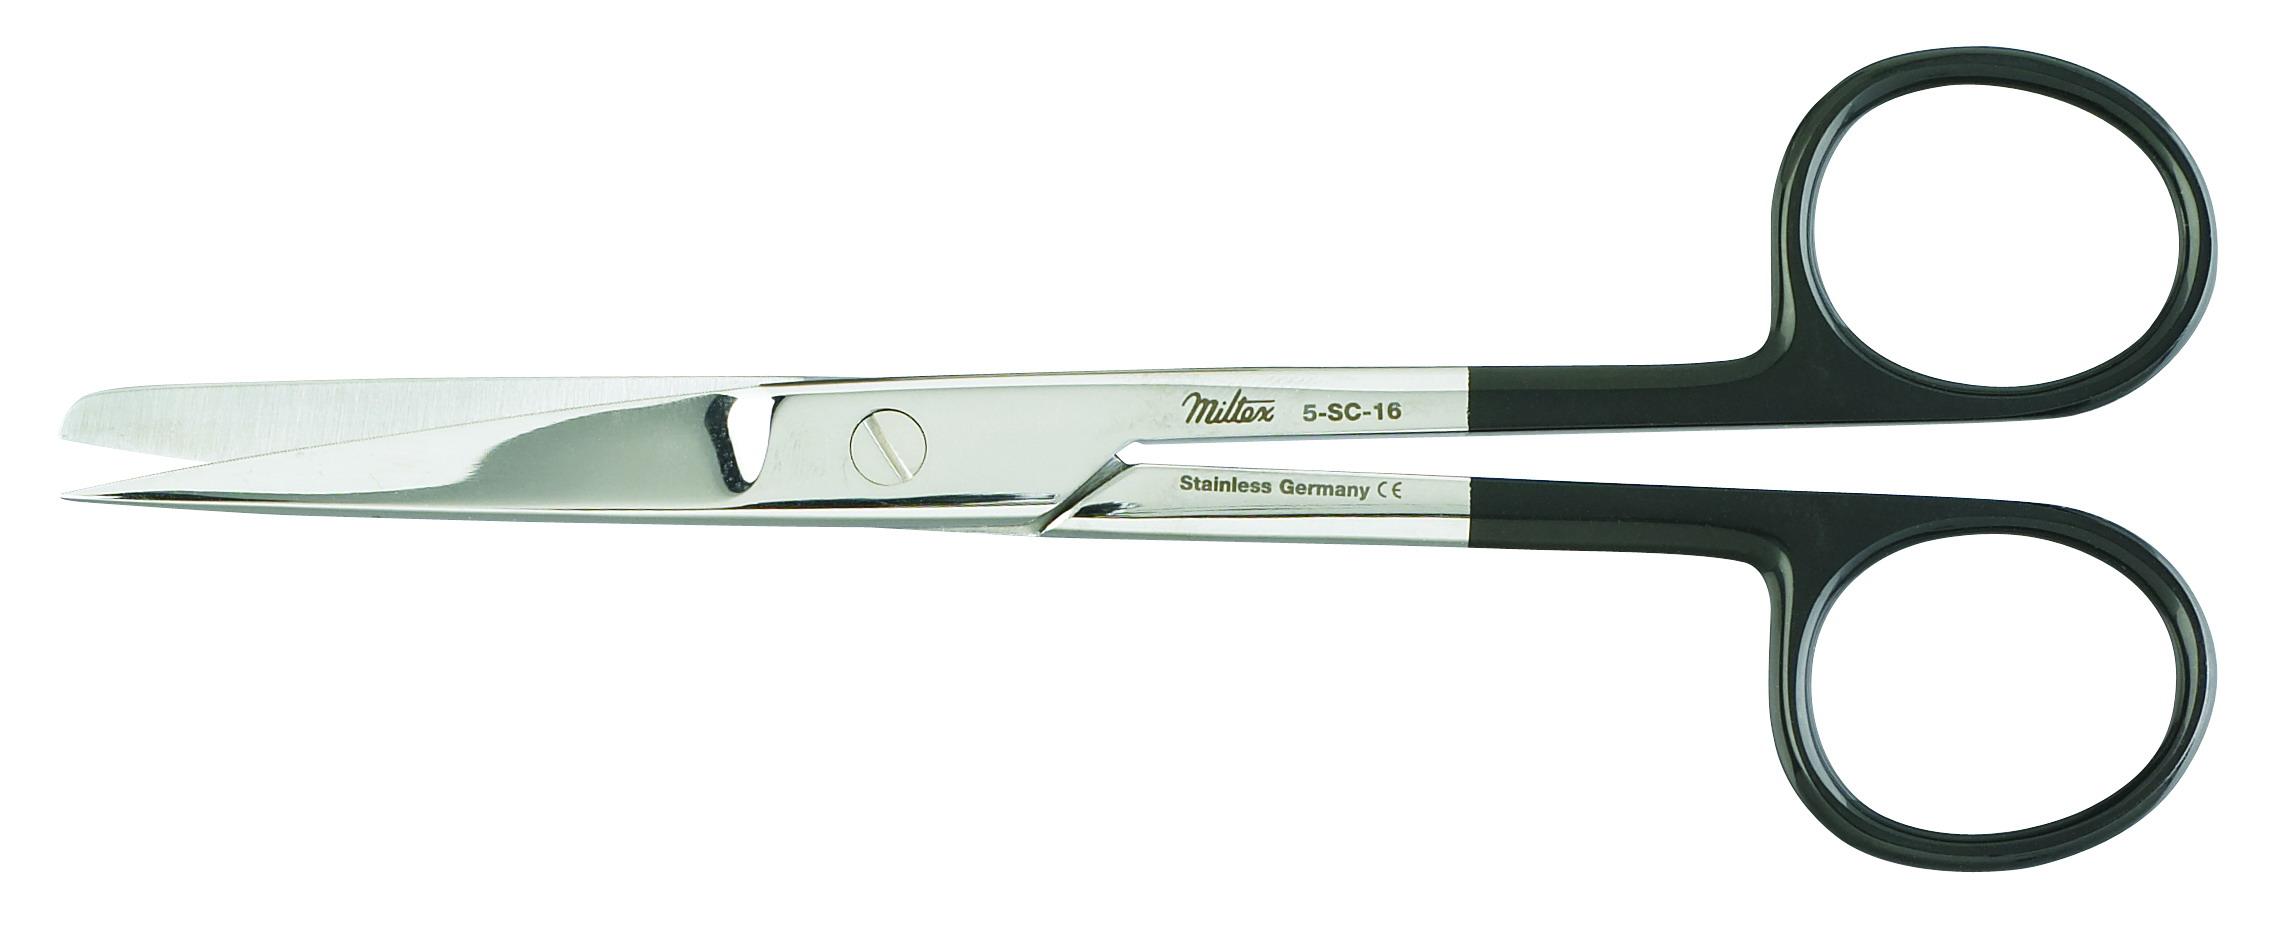 miltex-supercut-operating-scissors-5-1-2-14-cm-straight-sarp-blunt-5-sc-16-miltex.jpg